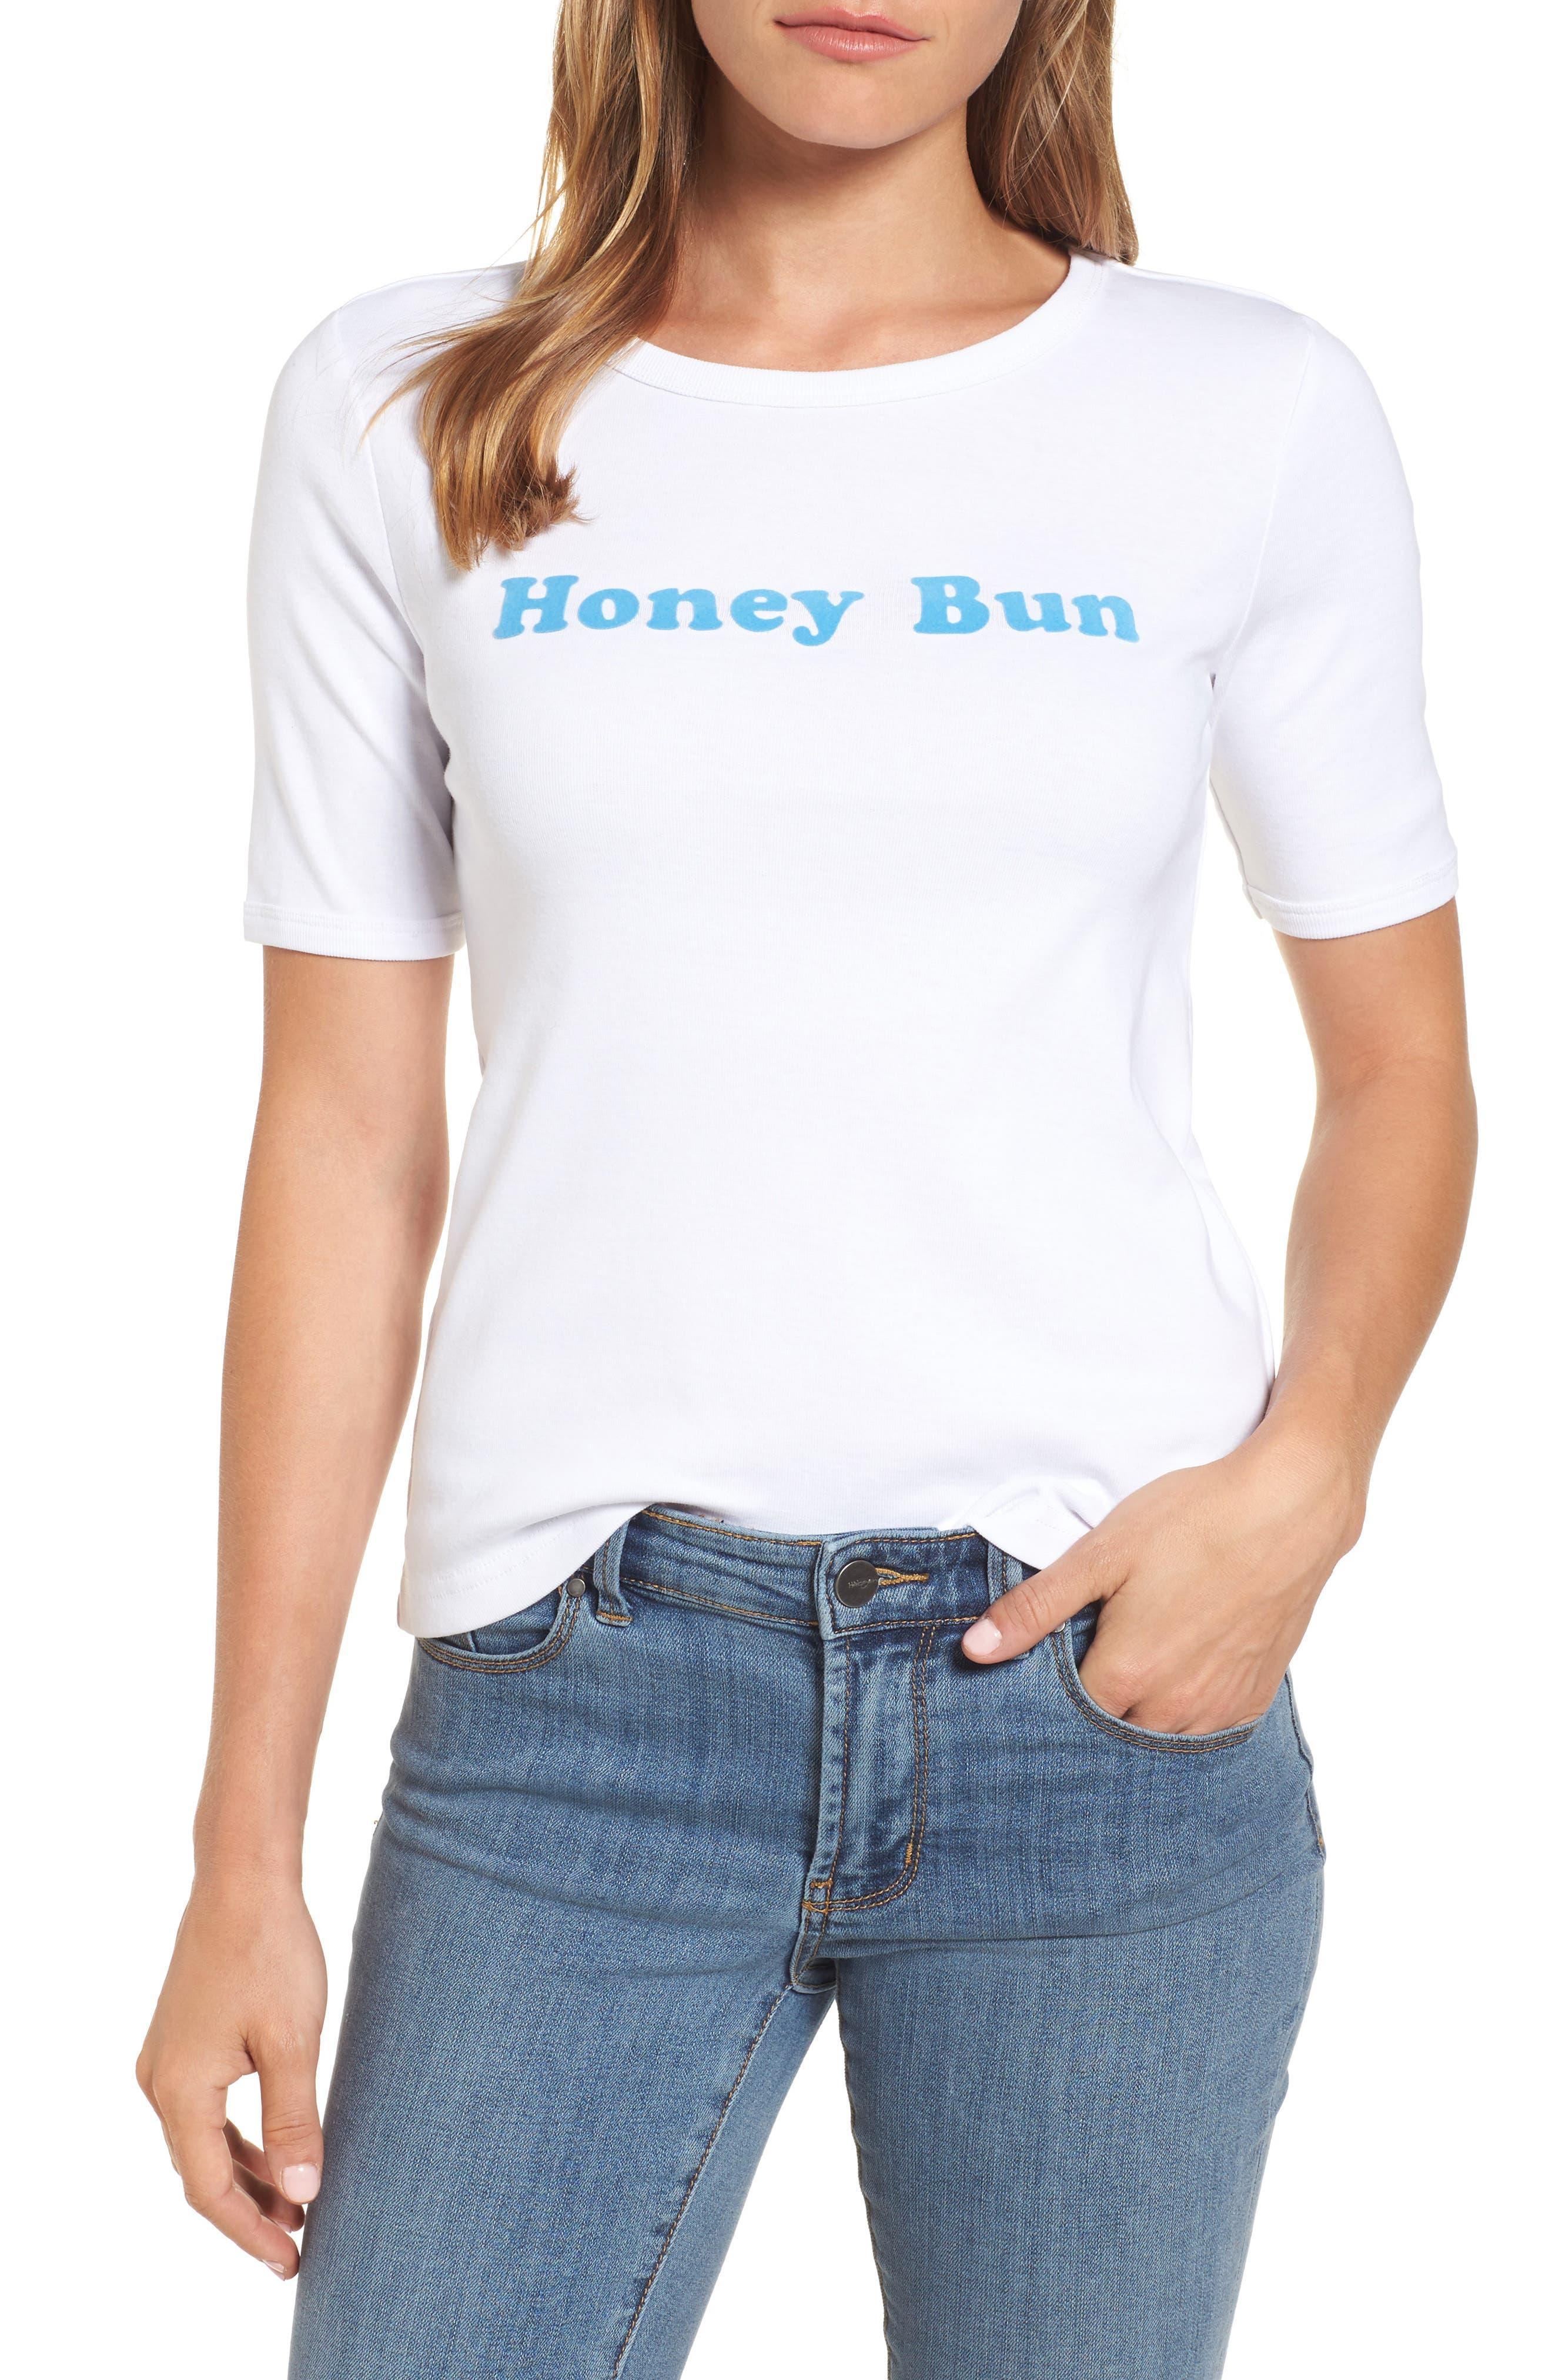 Honey Bun Tee,                         Main,                         color, 130